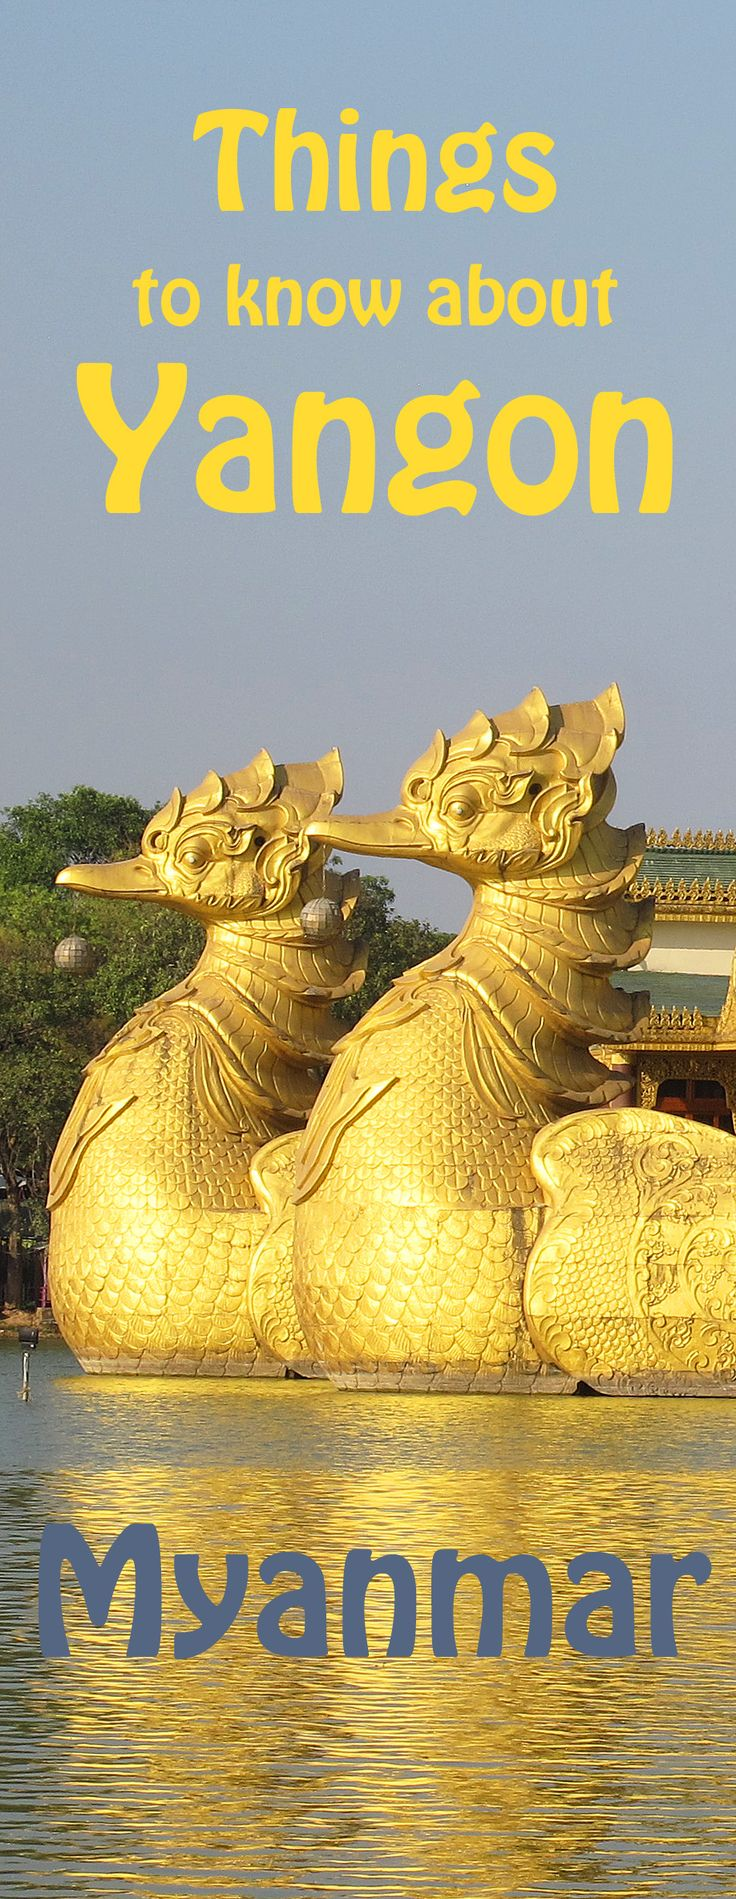 YANGON, Myanmar: 21 things to know ~ http://www.sandinmysuitcase.com/21-random-thoughts-on-yangon/